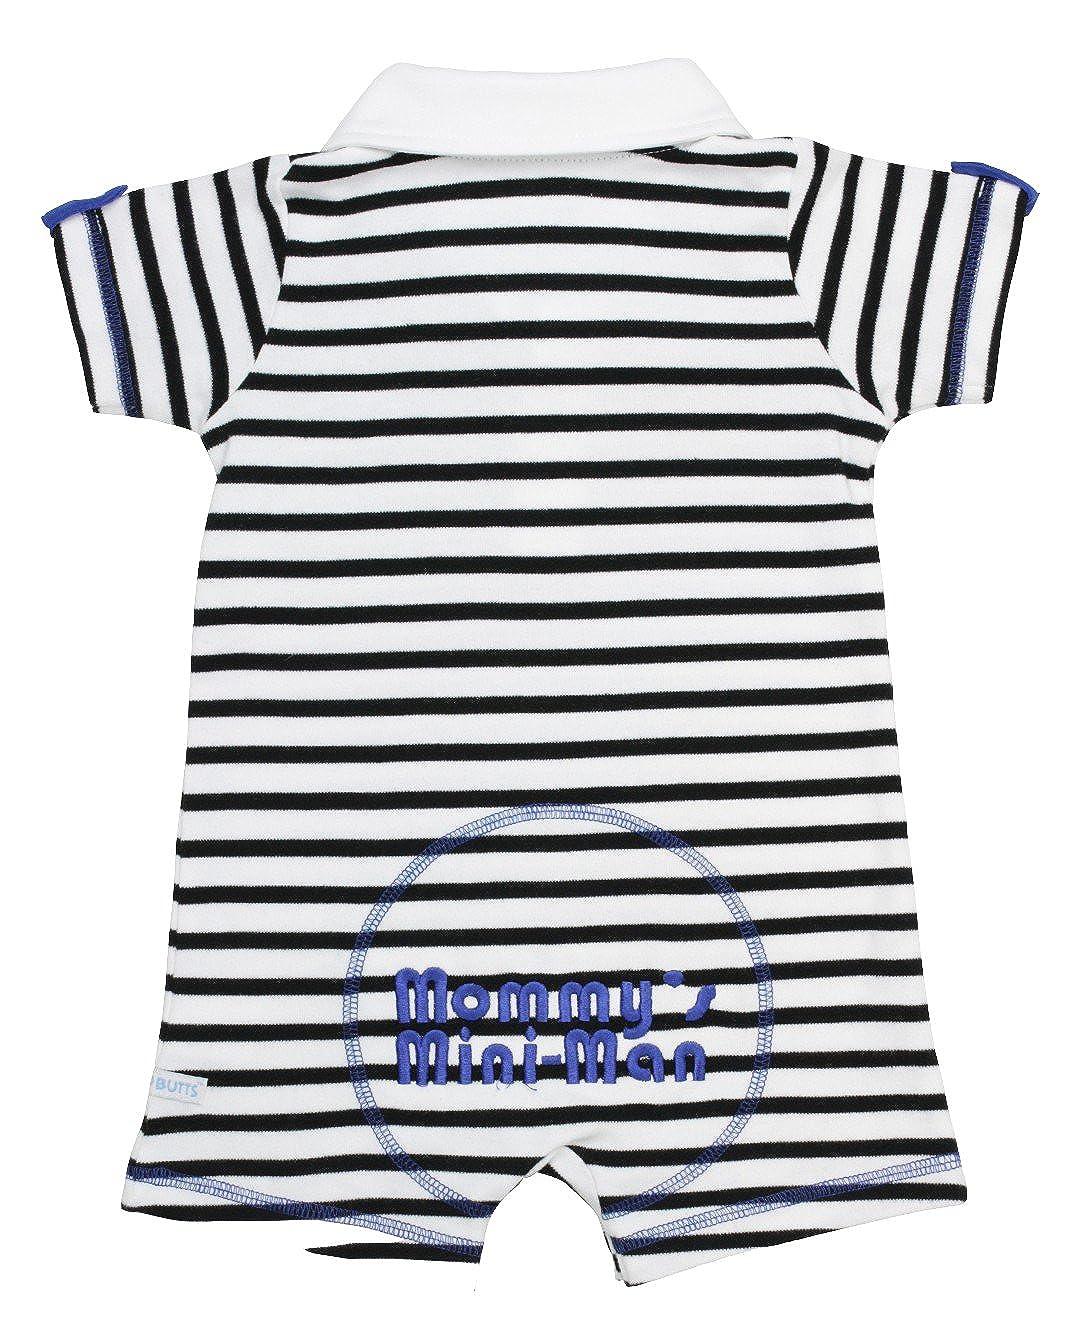 Ruggedbutts Baby-boys Mini-man Striped Polo Romper